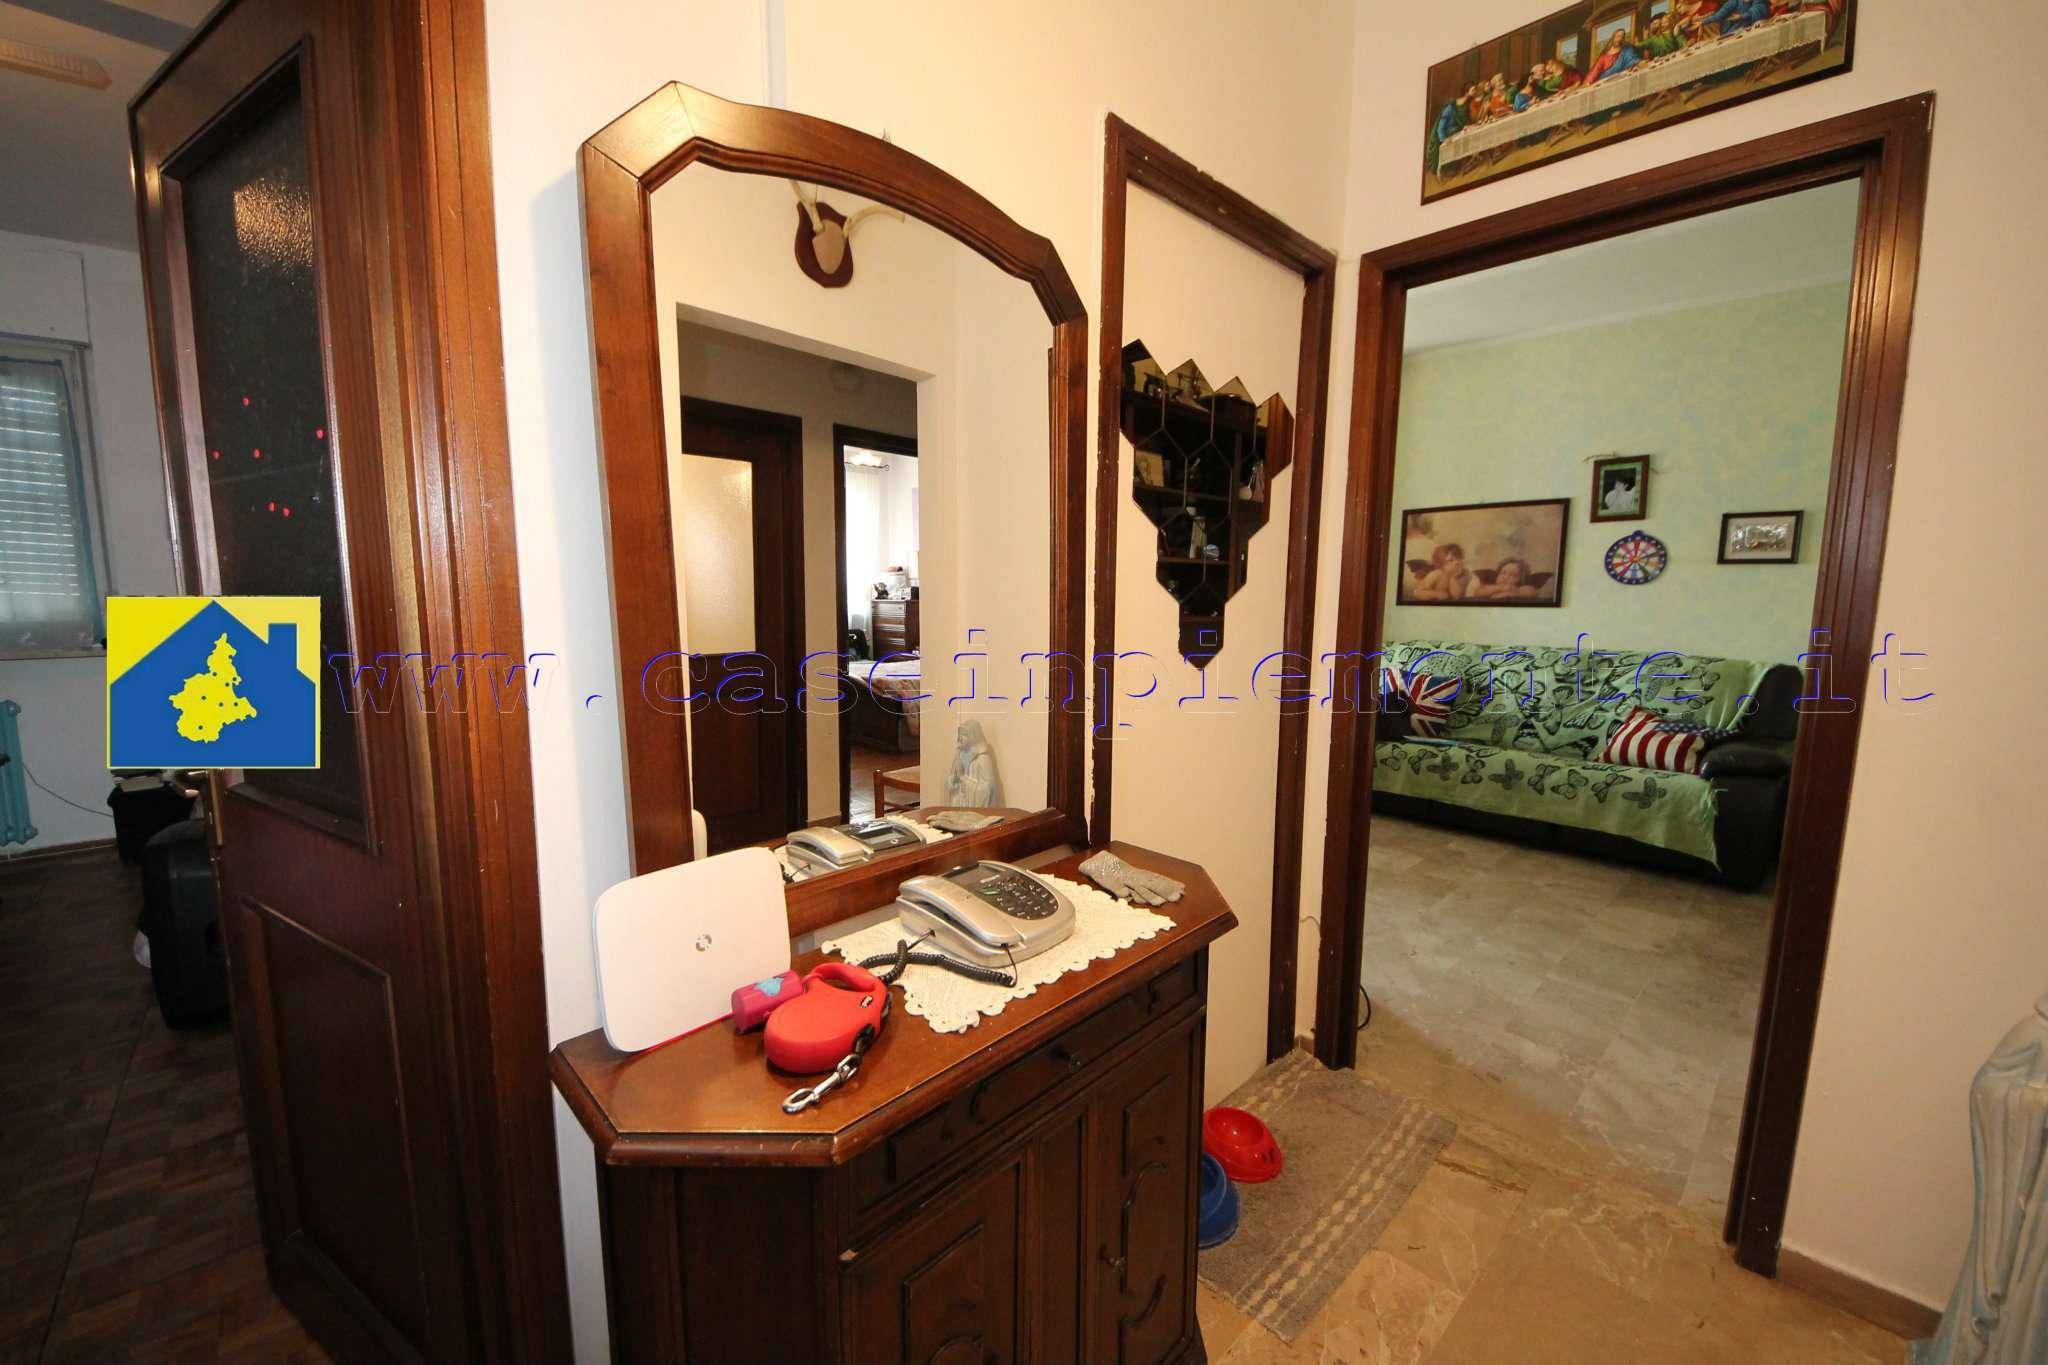 Ufficio Casa Piossasco : Quadrilocale piossasco vendita u20ac 73.000 90 mq riscaldamento autonomo